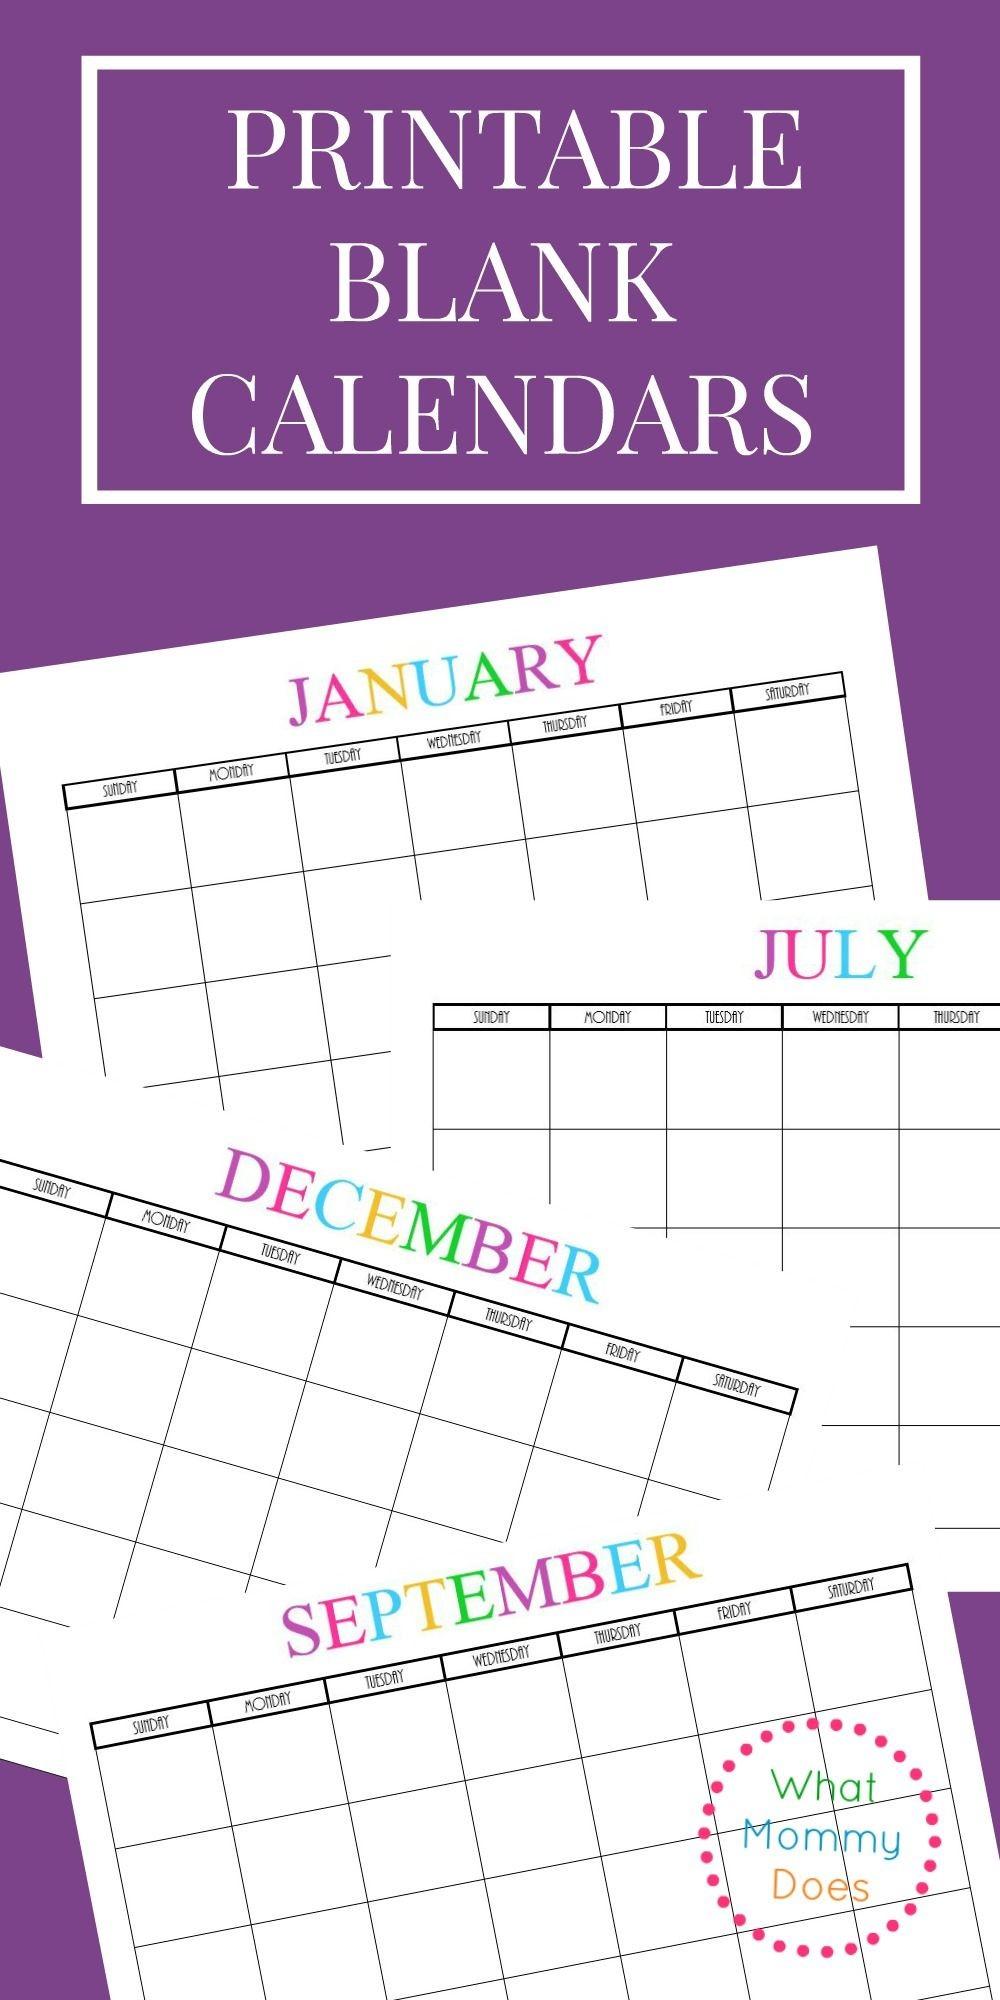 Printable 2020 Calendar by Month Free Printable Blank Monthly Calendars – 2018 2019 2020